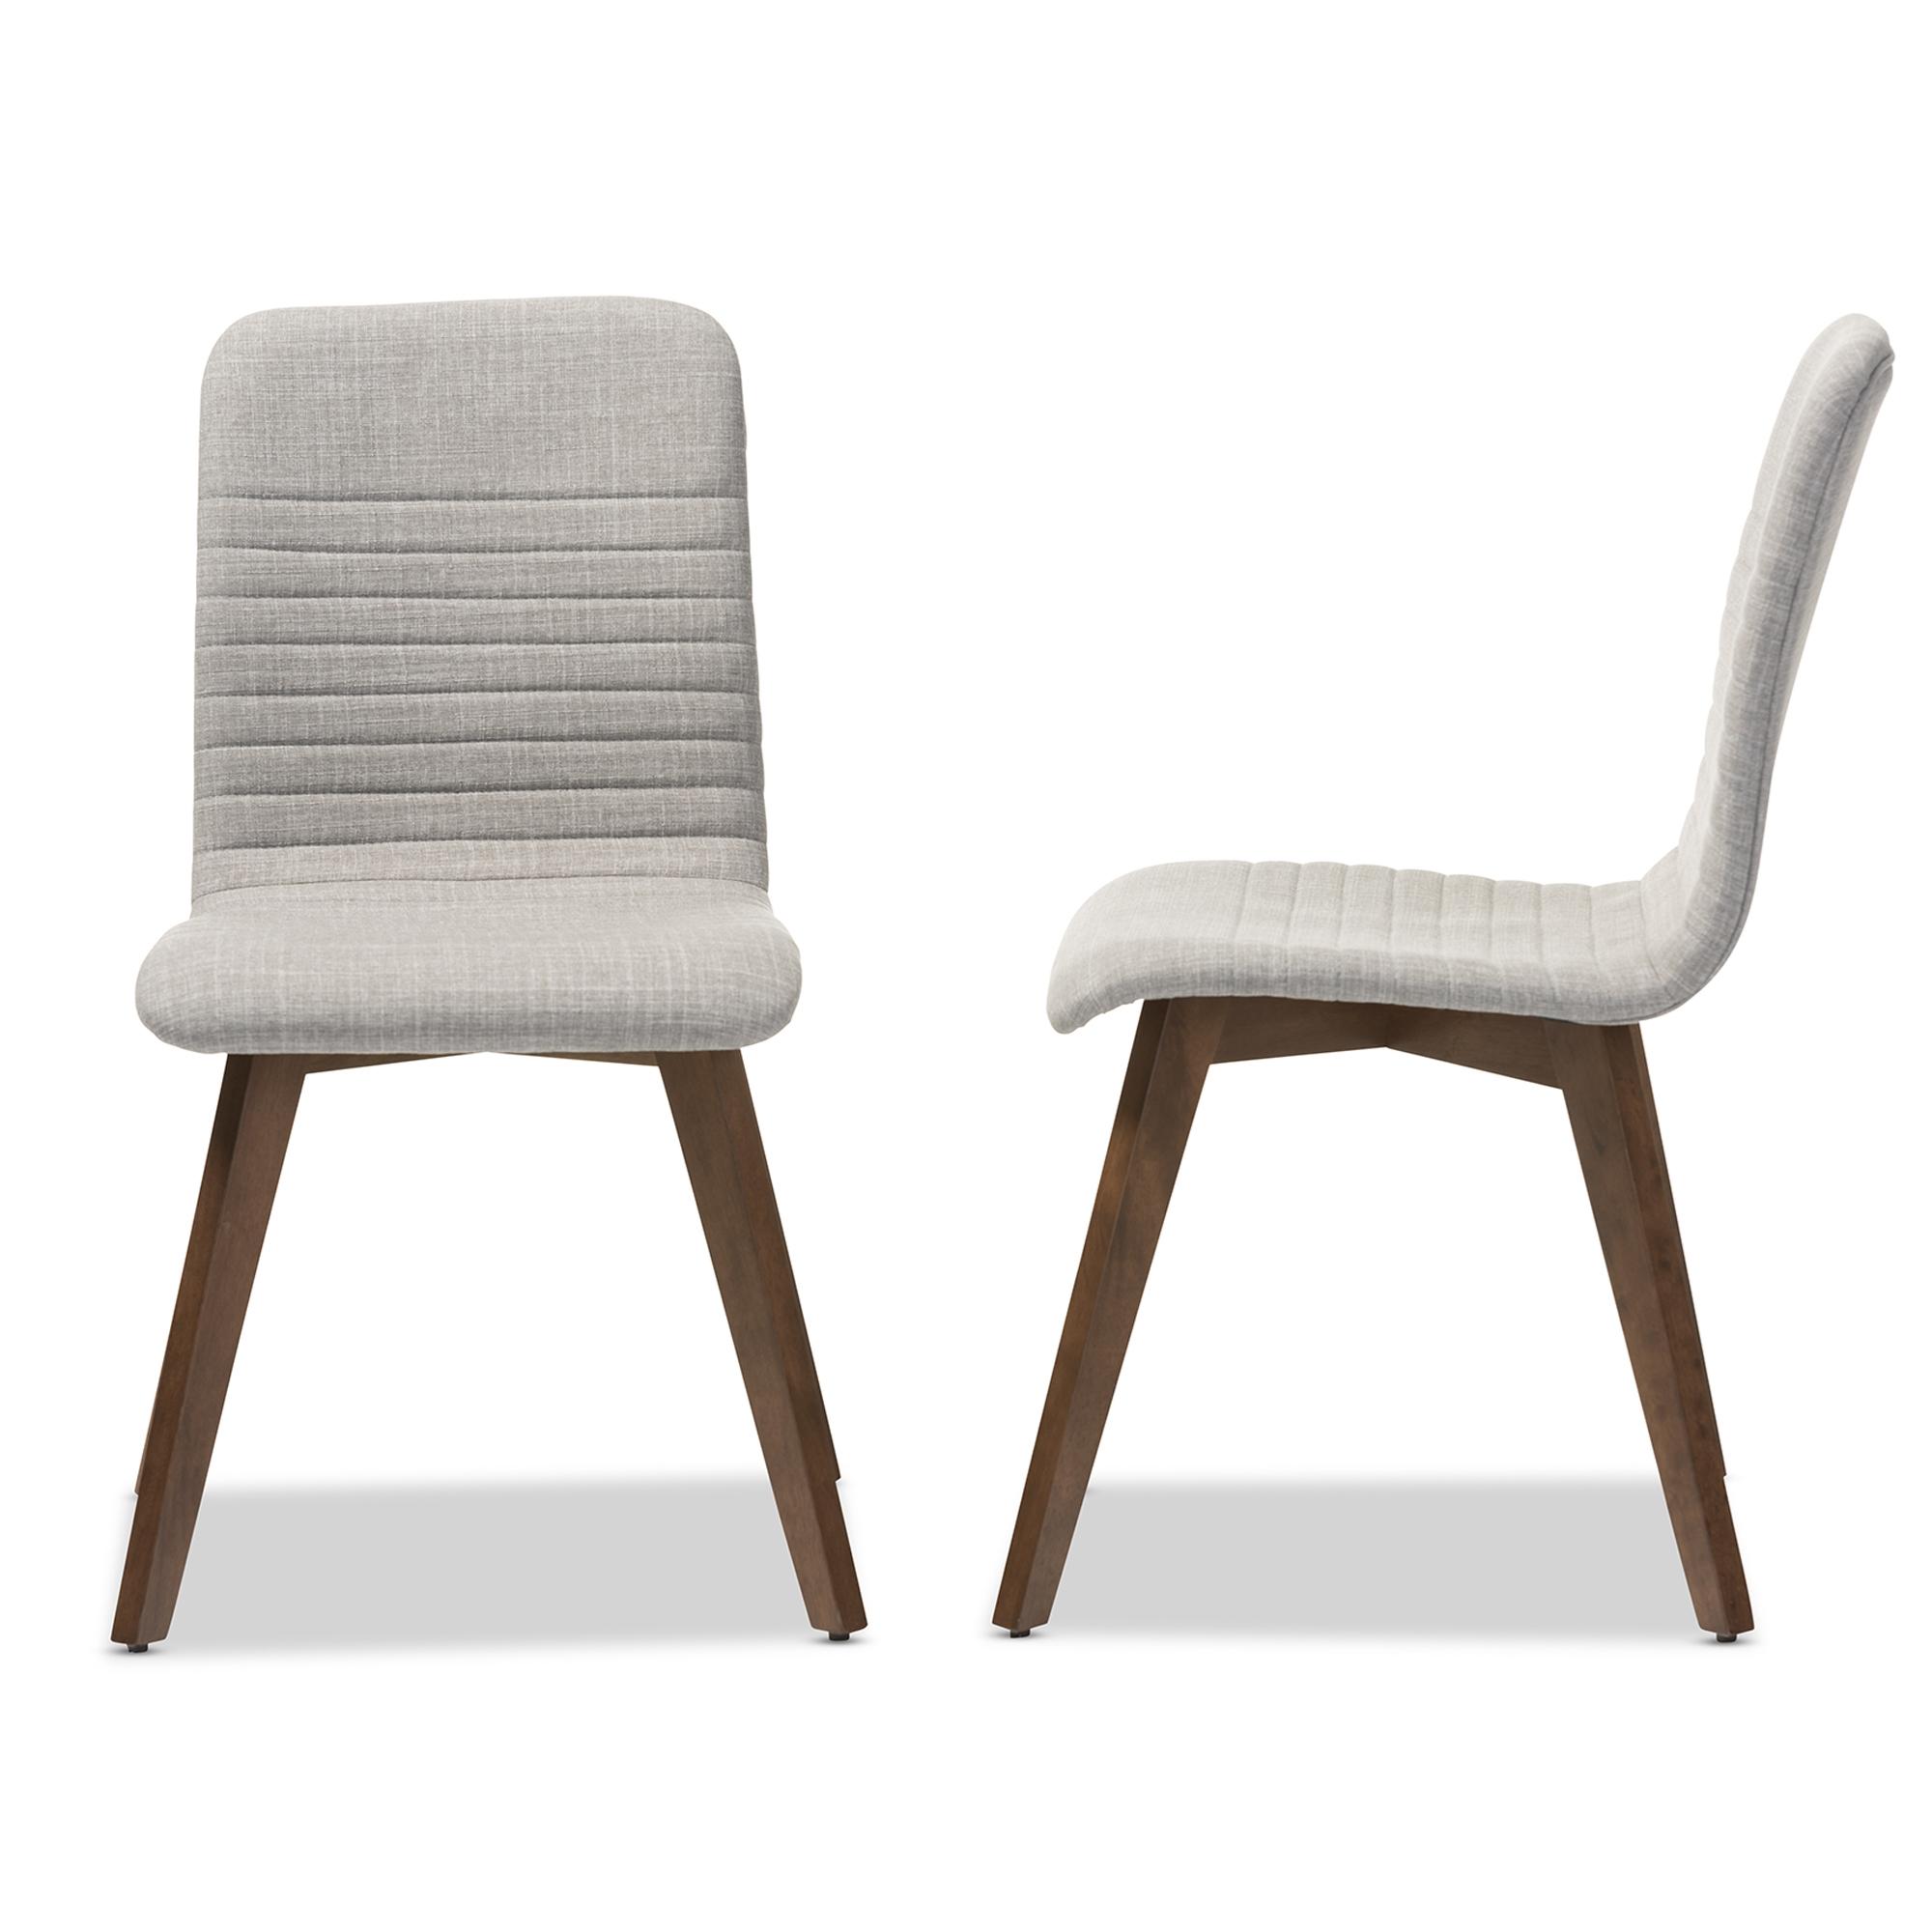 scandinavian retro furniture. Baxton Studio Sugar Mid-century Retro Modern Scandinavian Style Light Grey Fabric Upholstered Walnut Wood Furniture D